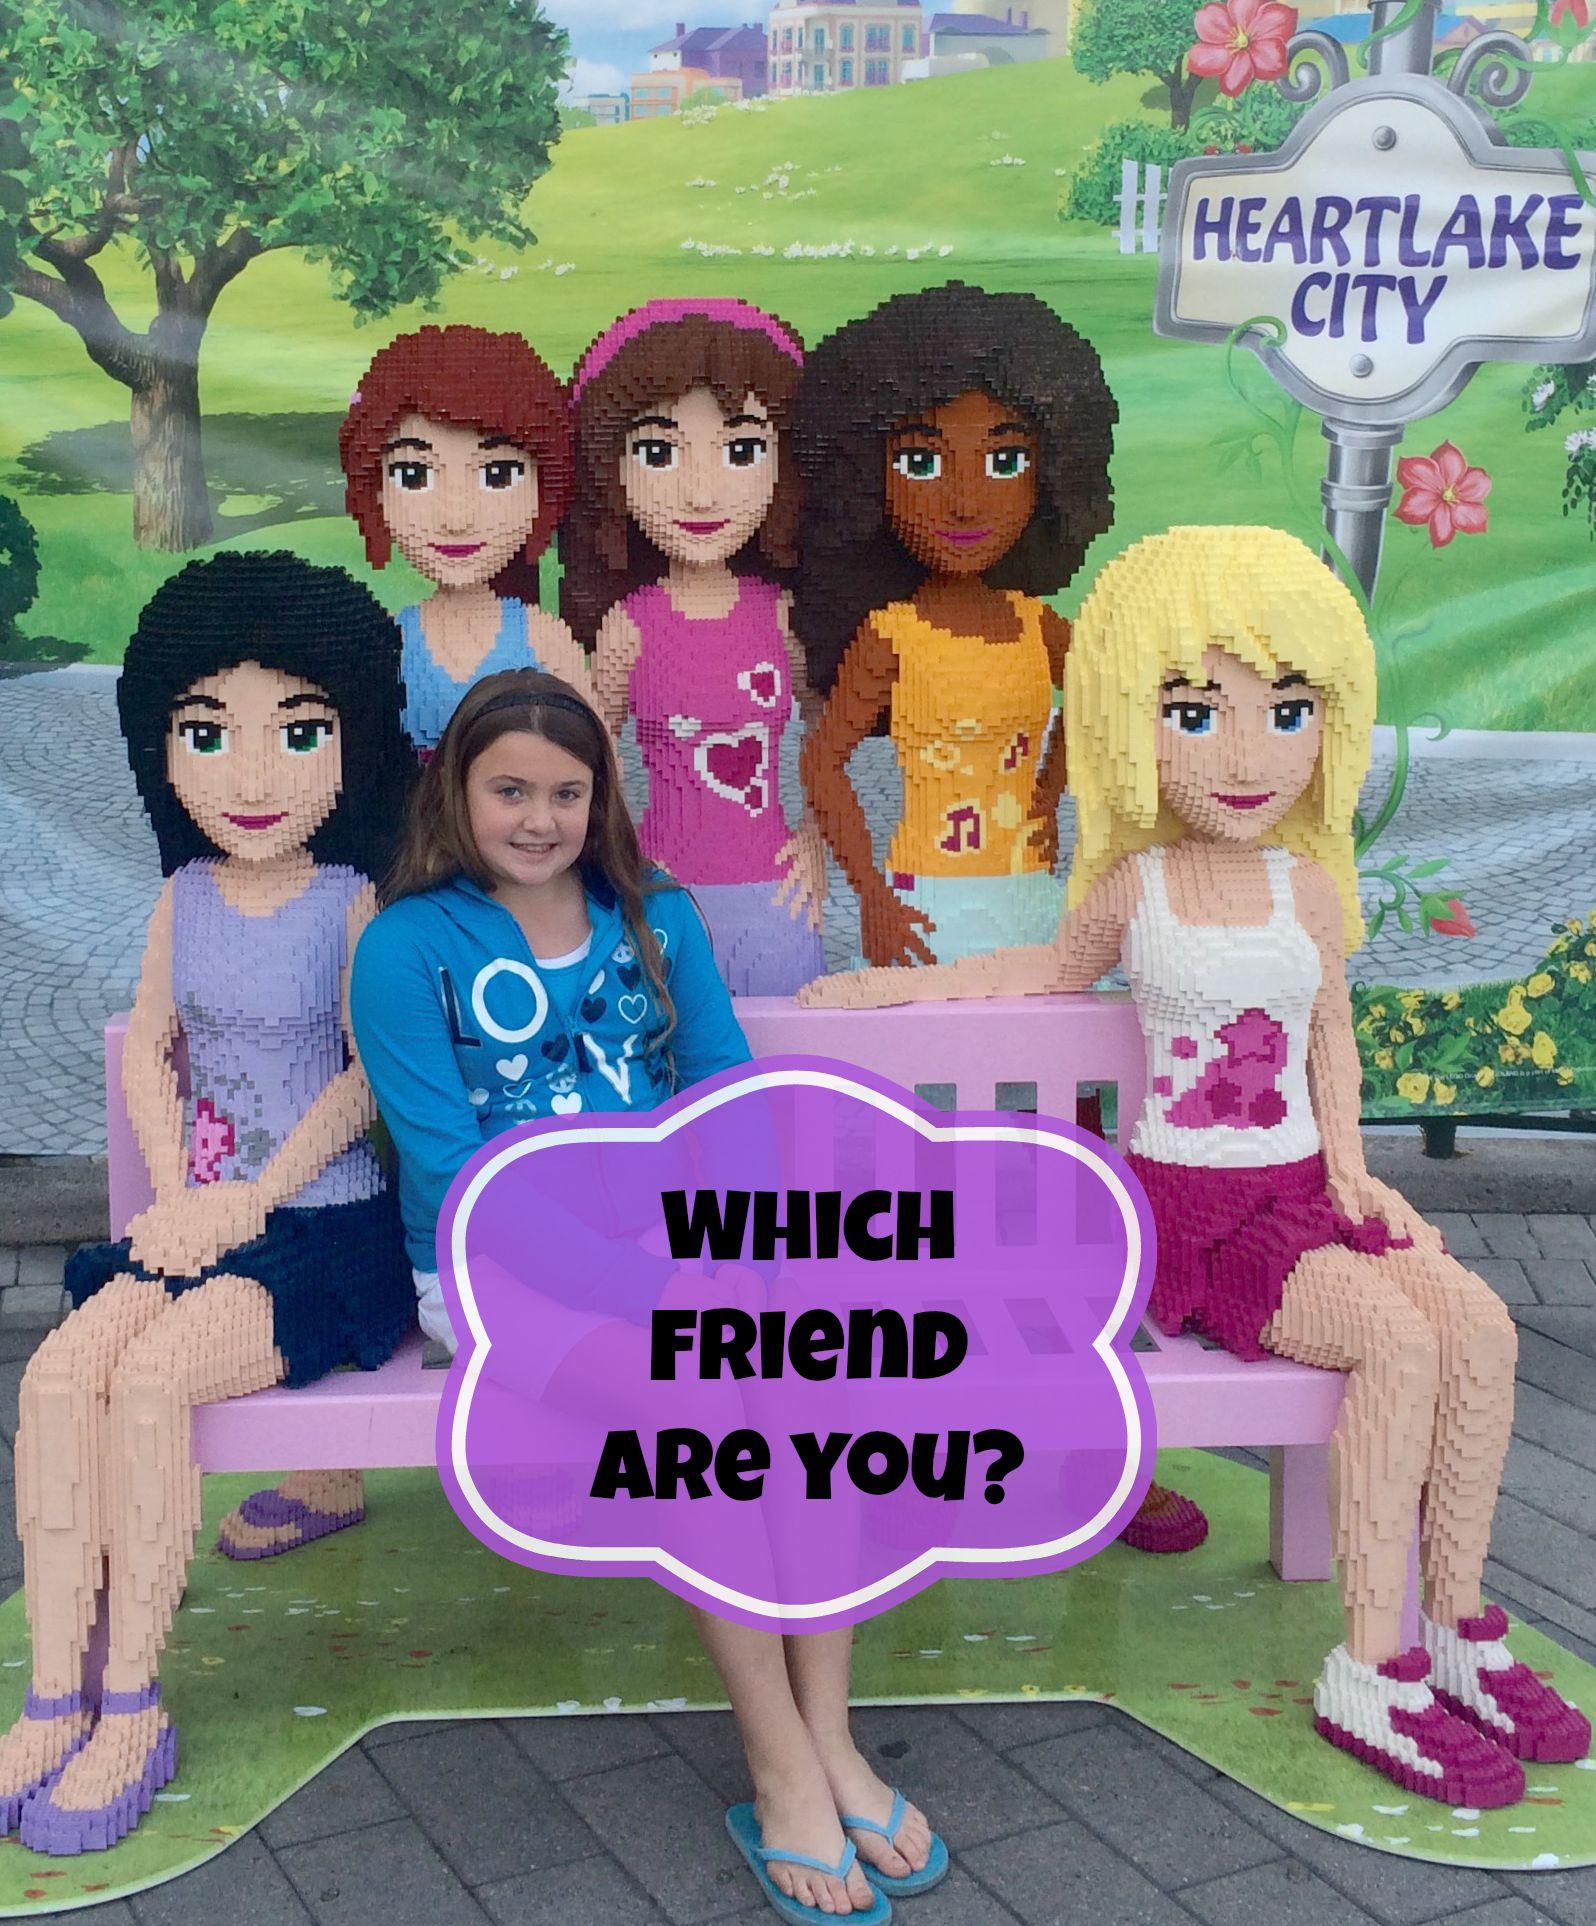 Fan Designed Lego Friends Heartlake City: Calling All LEGOLAND Heartlake City Fans! Take This Fun